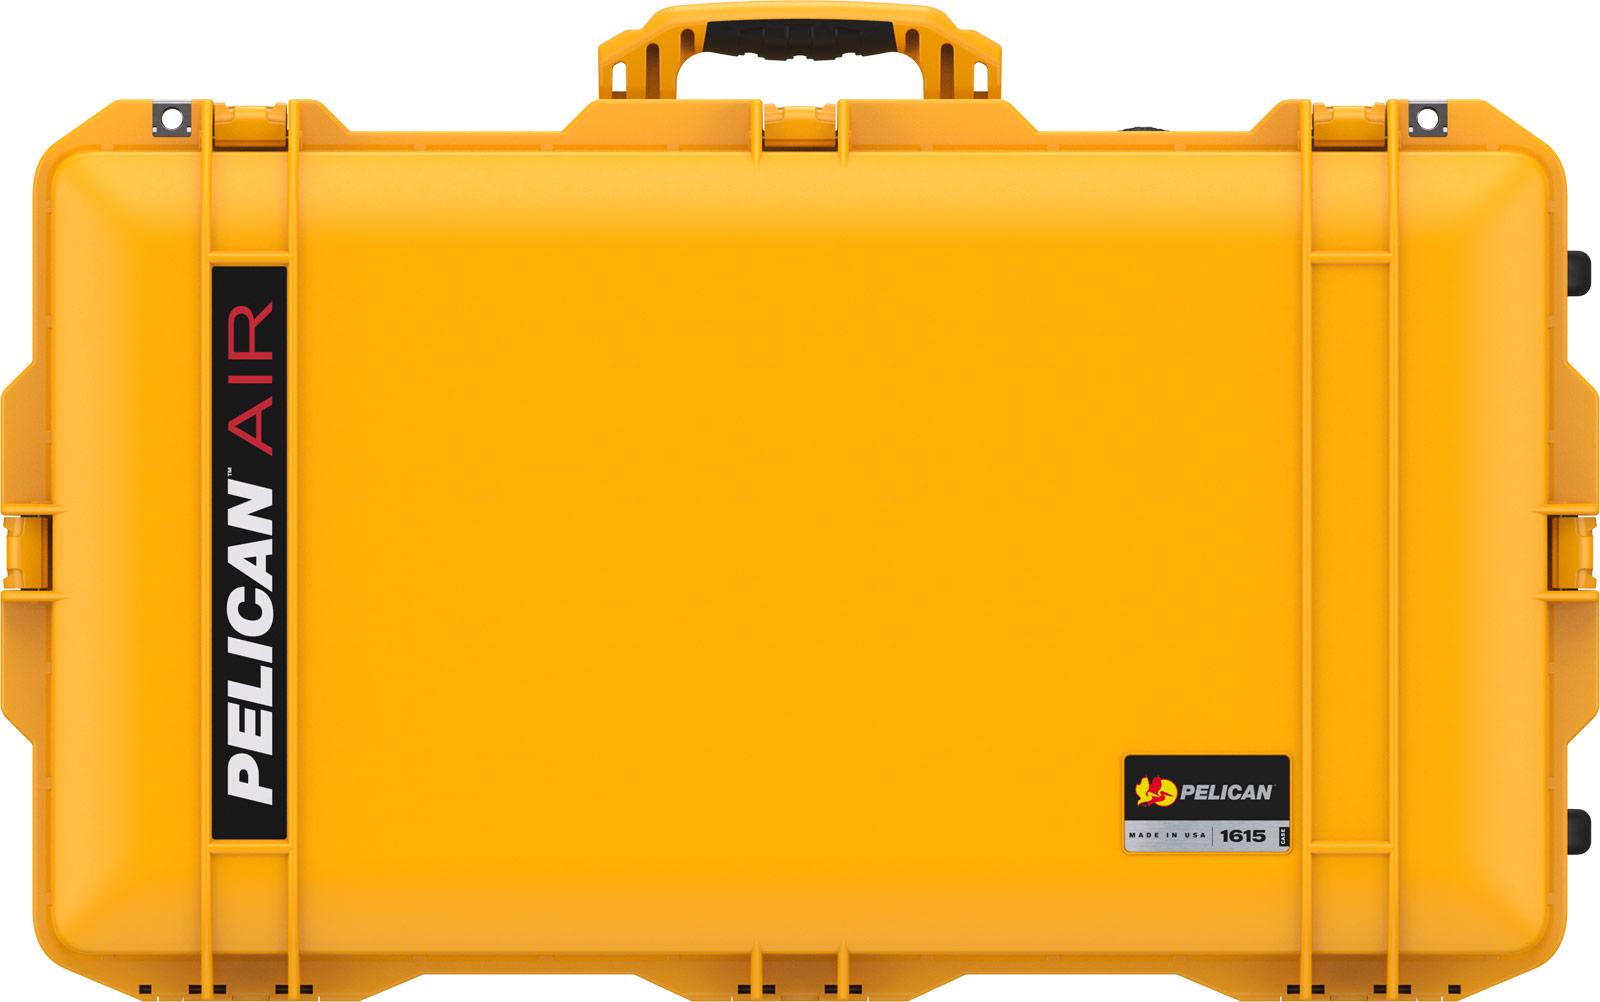 pelican 1615 yellow air case hard case